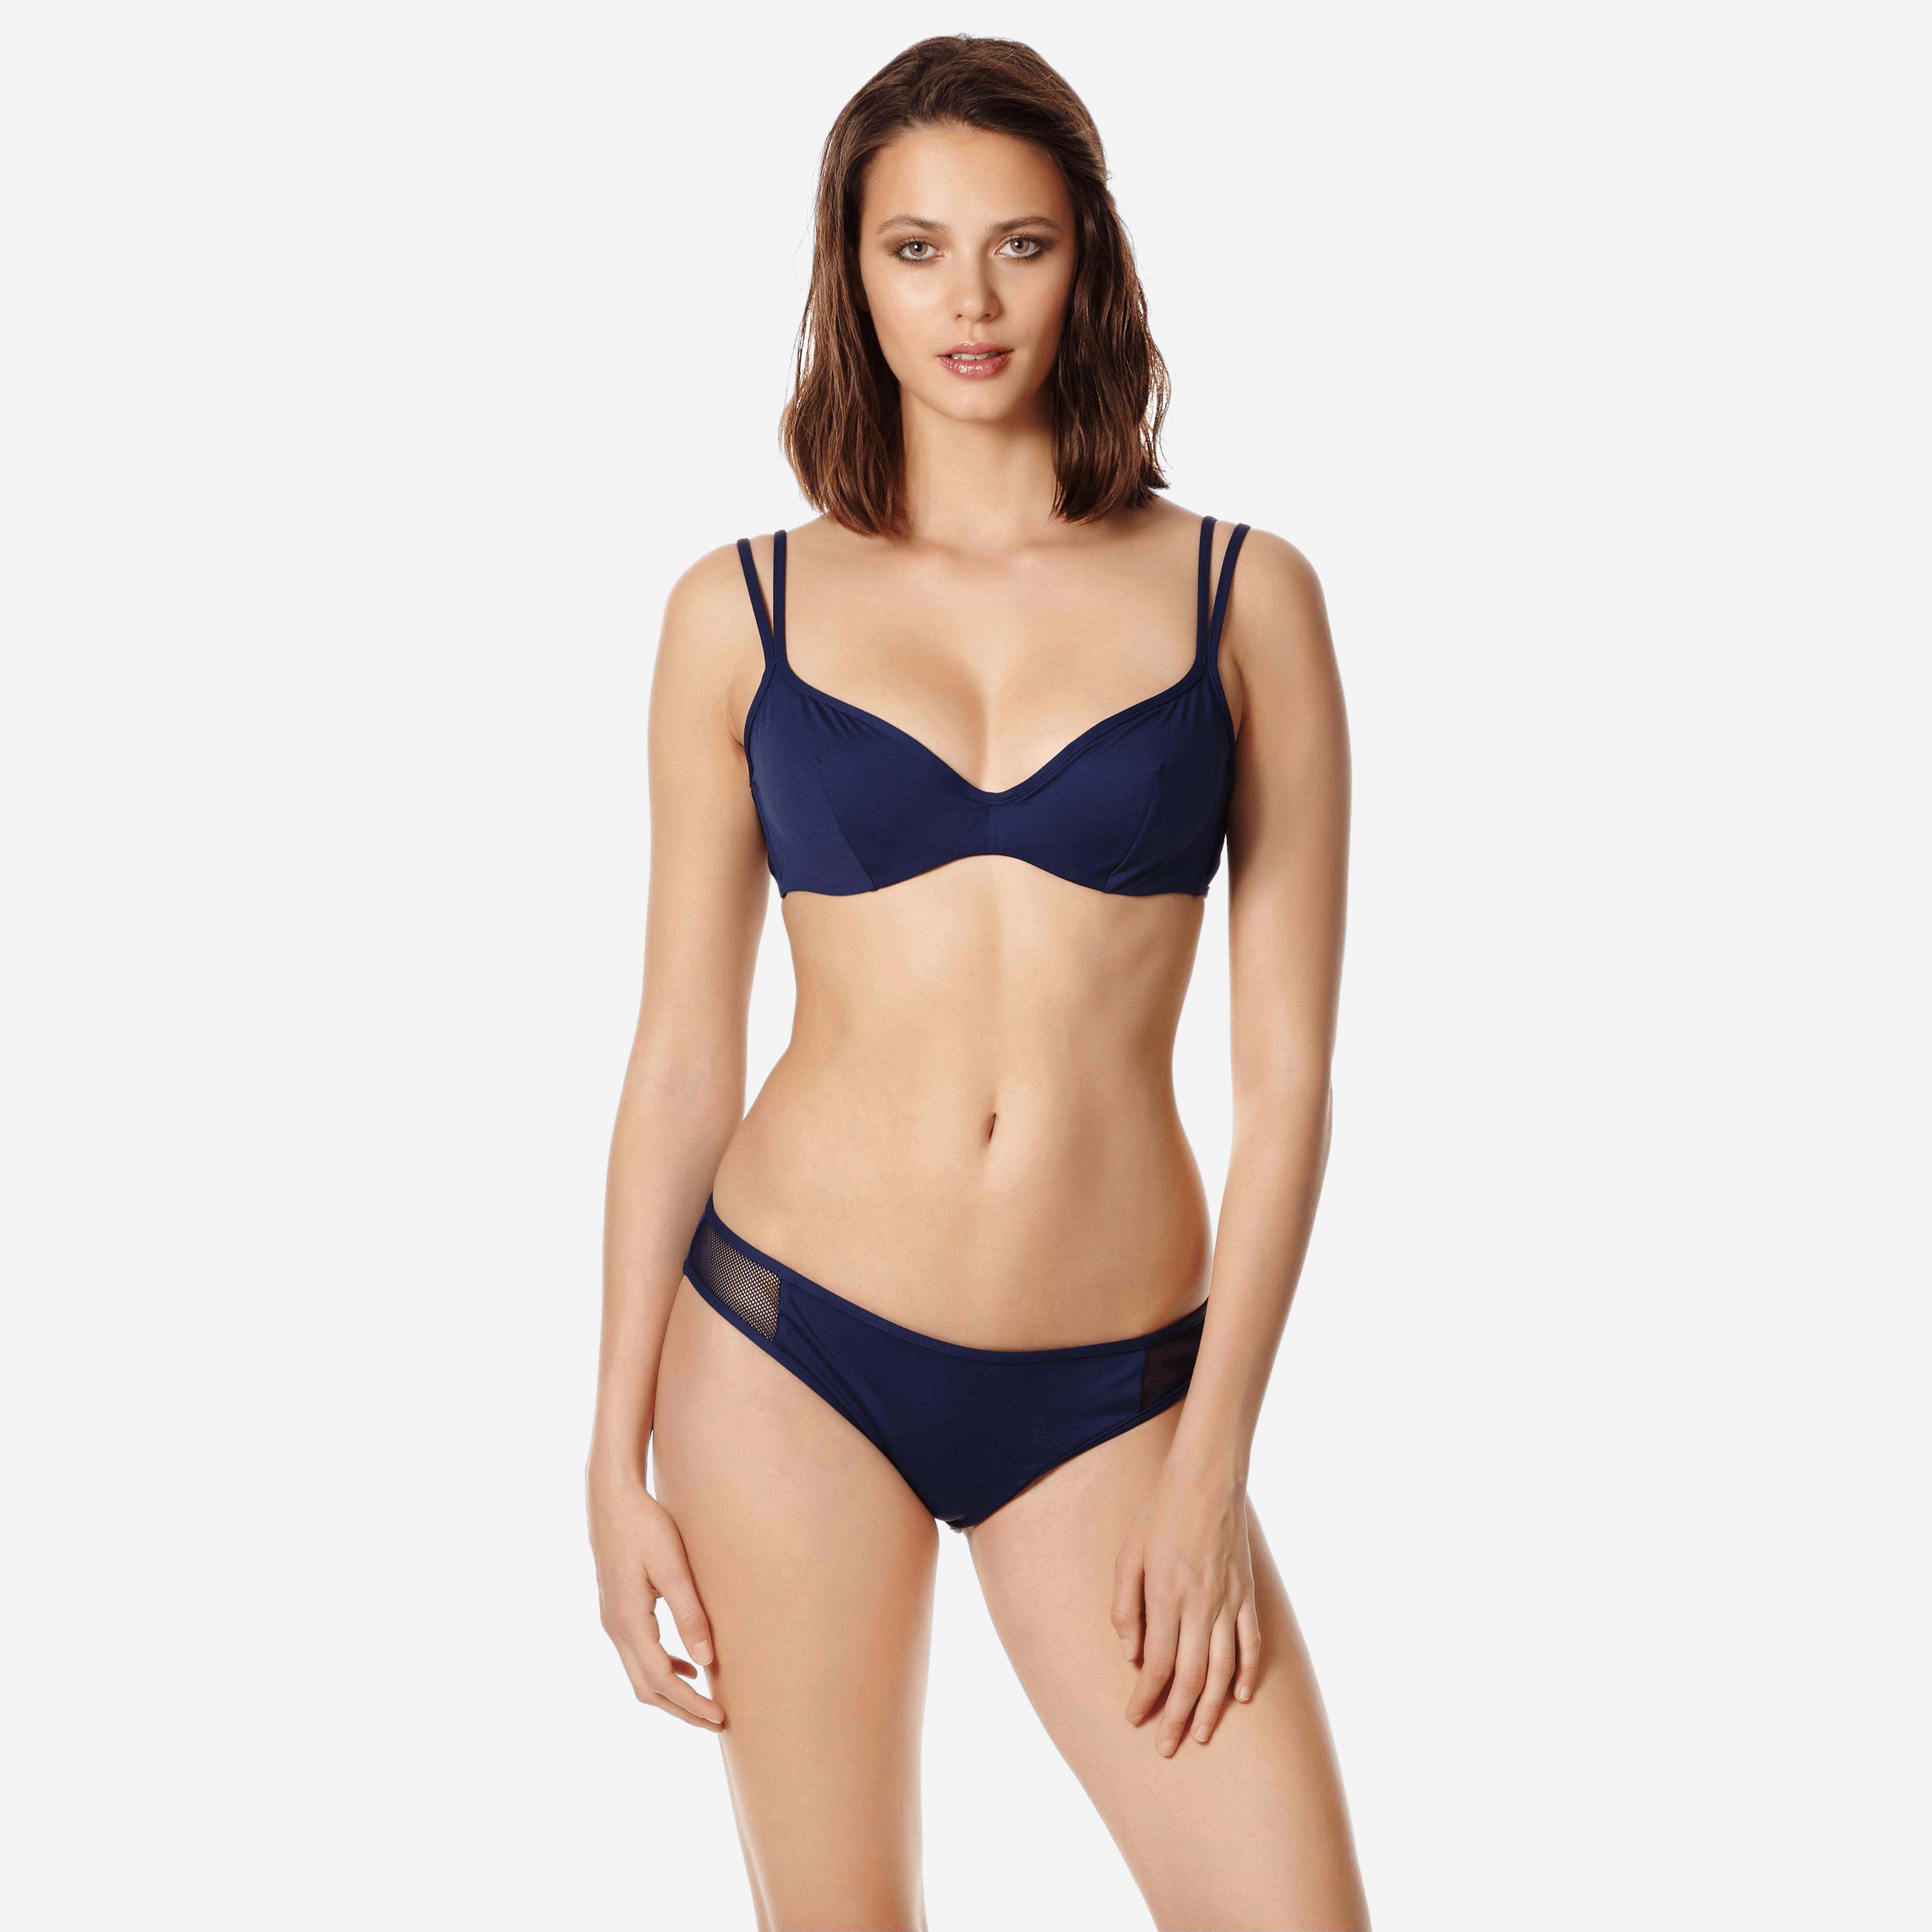 VILEBREQUIN | Women Swimwear - Women Midi Brief Bikini Bottom Solid Net - SWIMMING TRUNK - FAUSTINE - Blue - XXS - Vilebrequin | Goxip